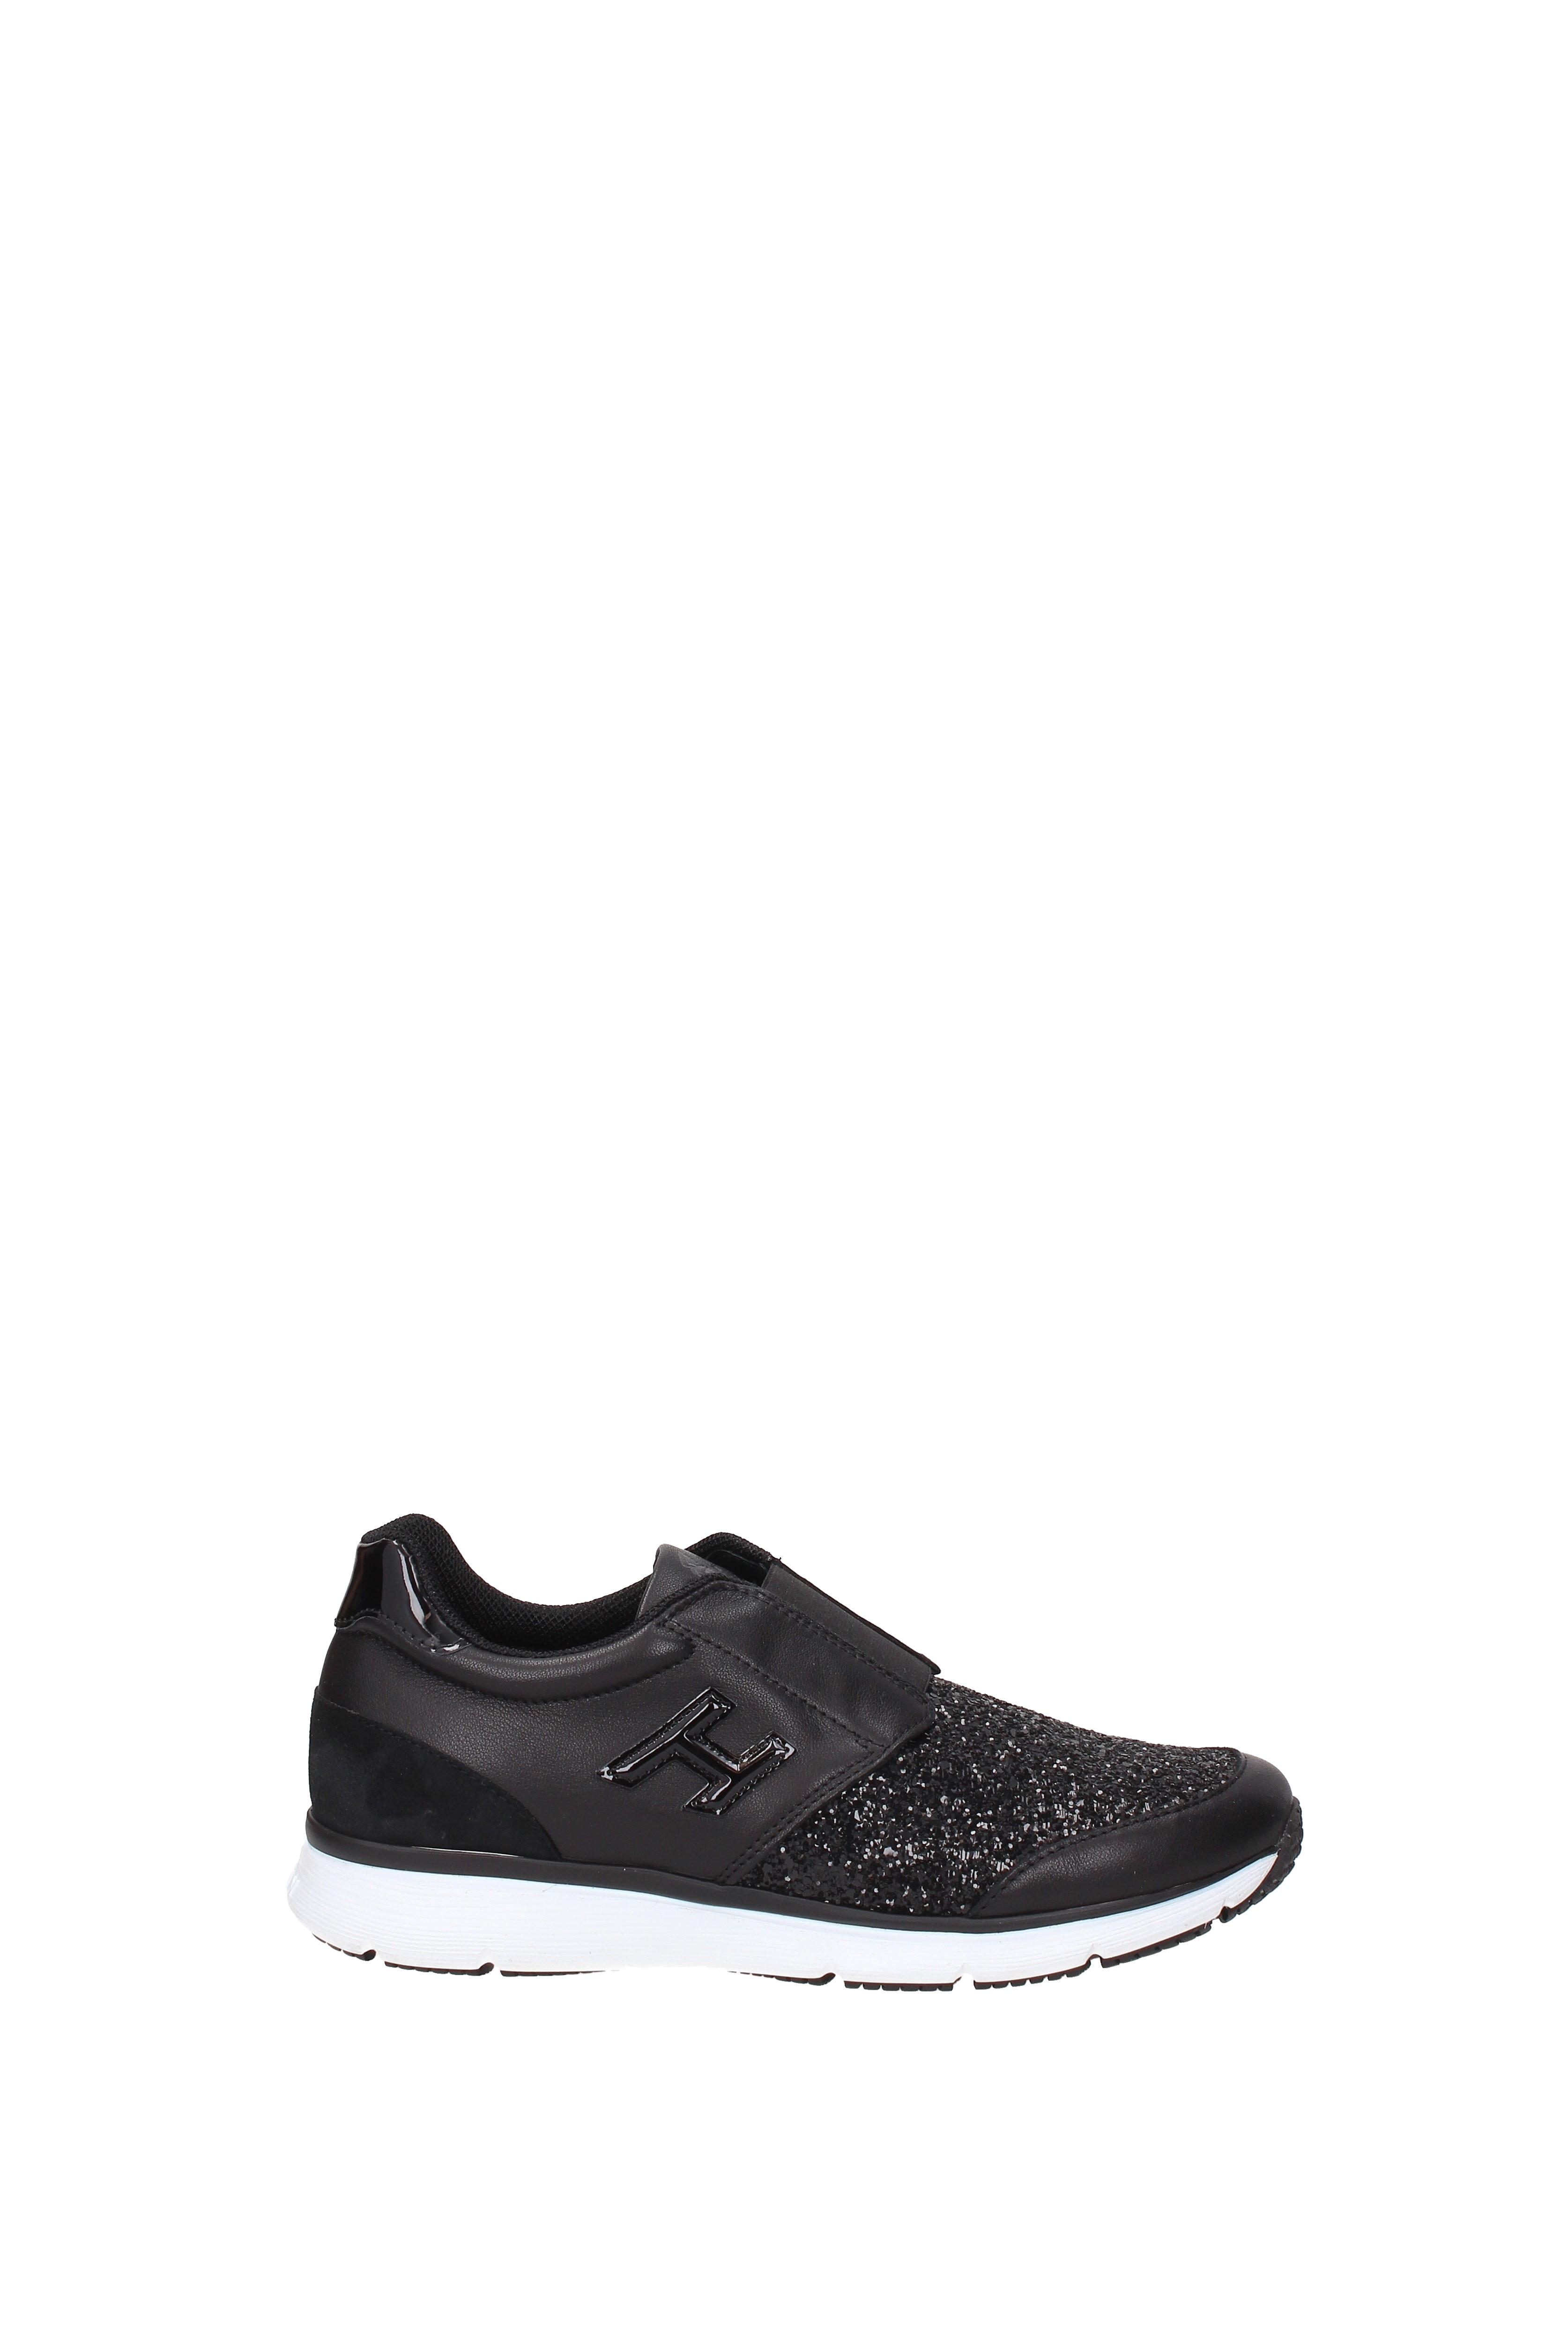 Sneakers Hogan Hogan Sneakers Damen - Glitter (HXW2540W490ESW) 407617